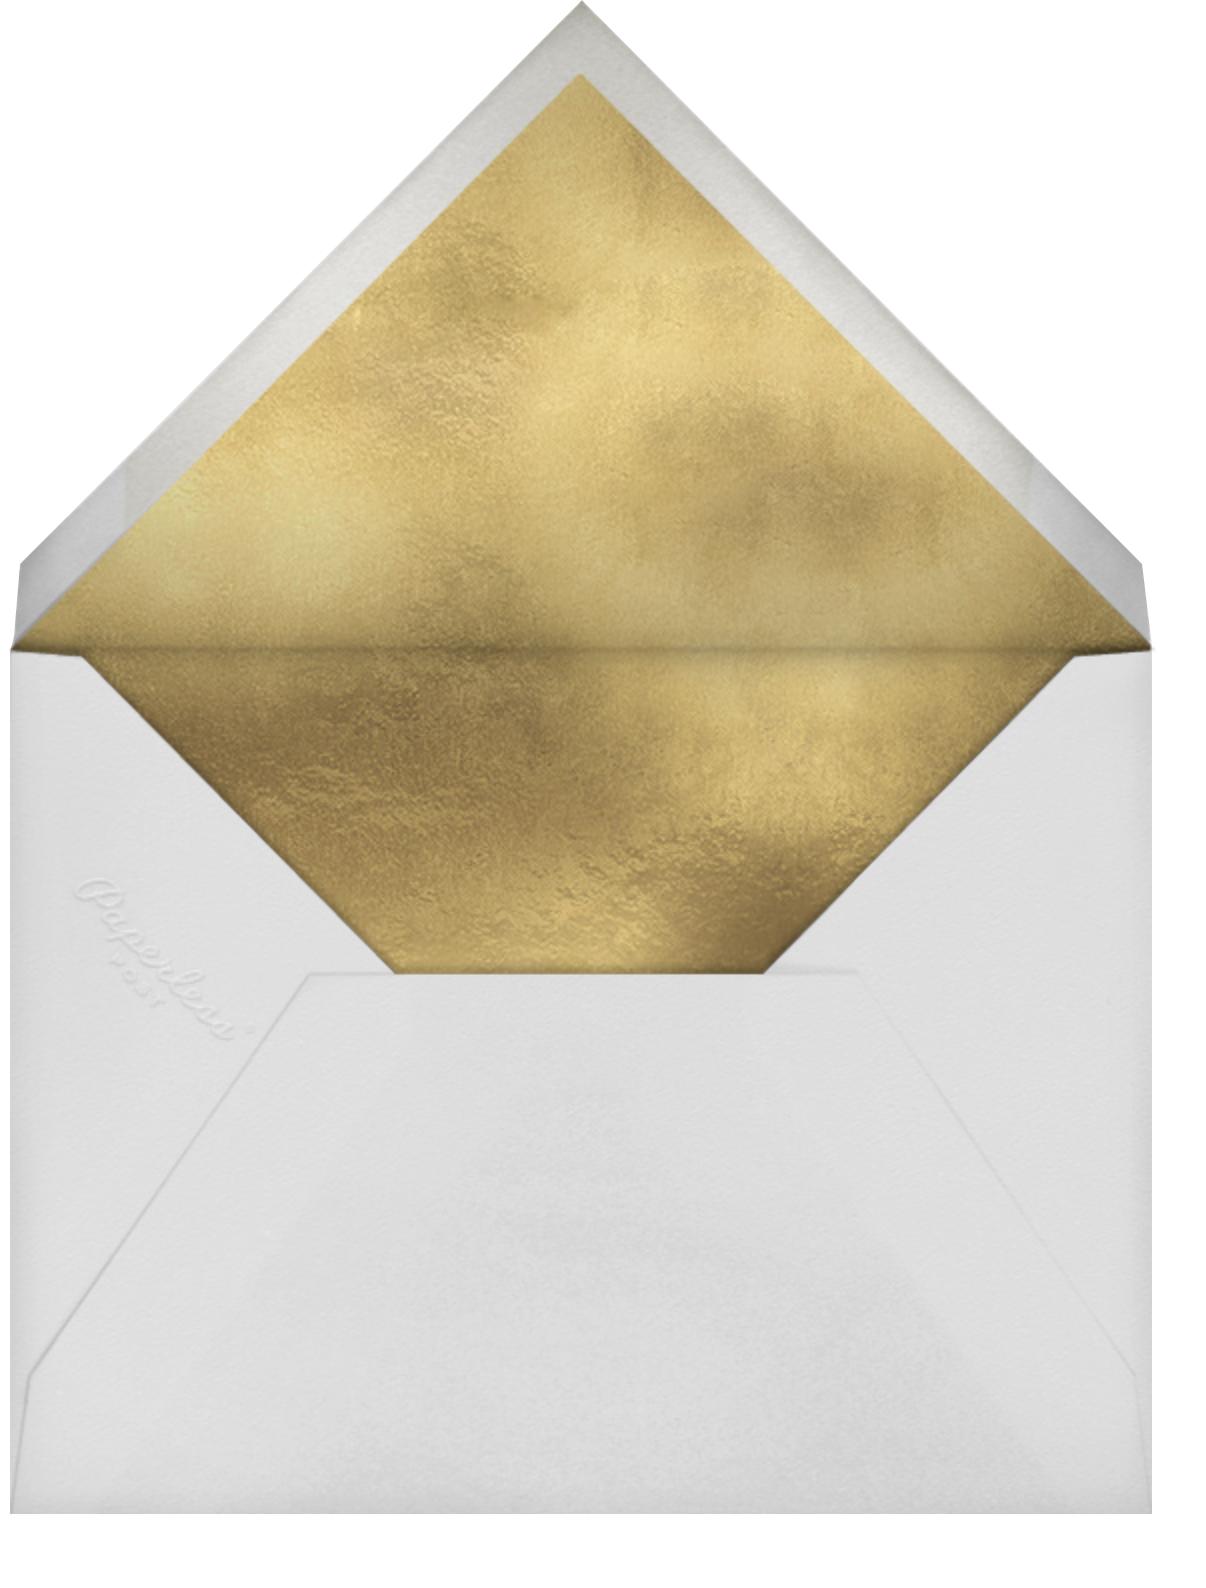 Birthday Cheer - Rifle Paper Co. - Envelope